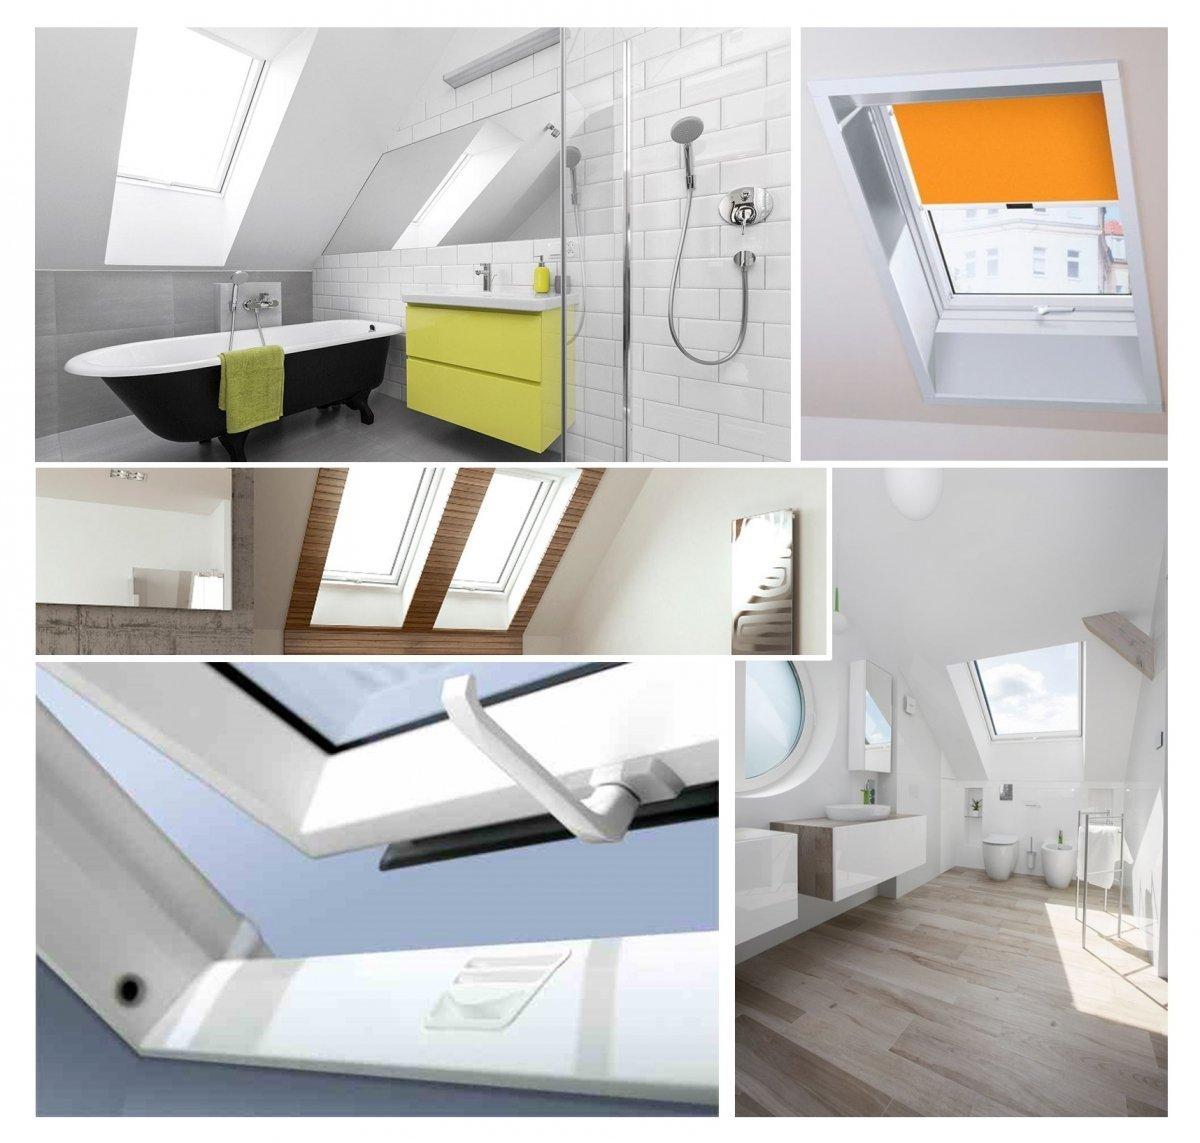 dachfenster fakro ptp v u4 3 fach verglasung schwingfenster energiesparende uw 1 1 ug 7 w m k. Black Bedroom Furniture Sets. Home Design Ideas